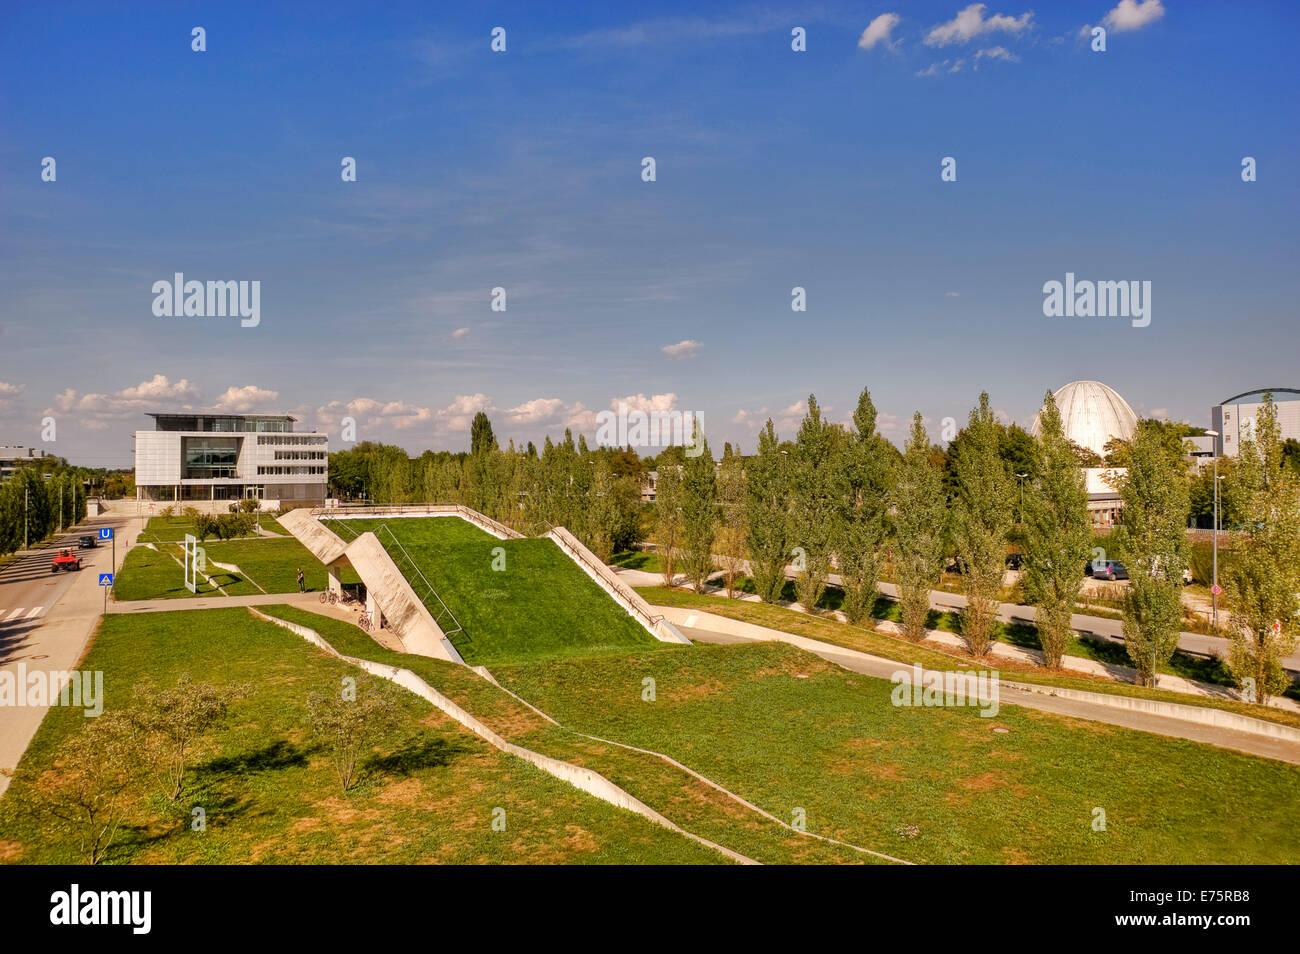 Ludwig Maximilian University Of Munich Stock Photos